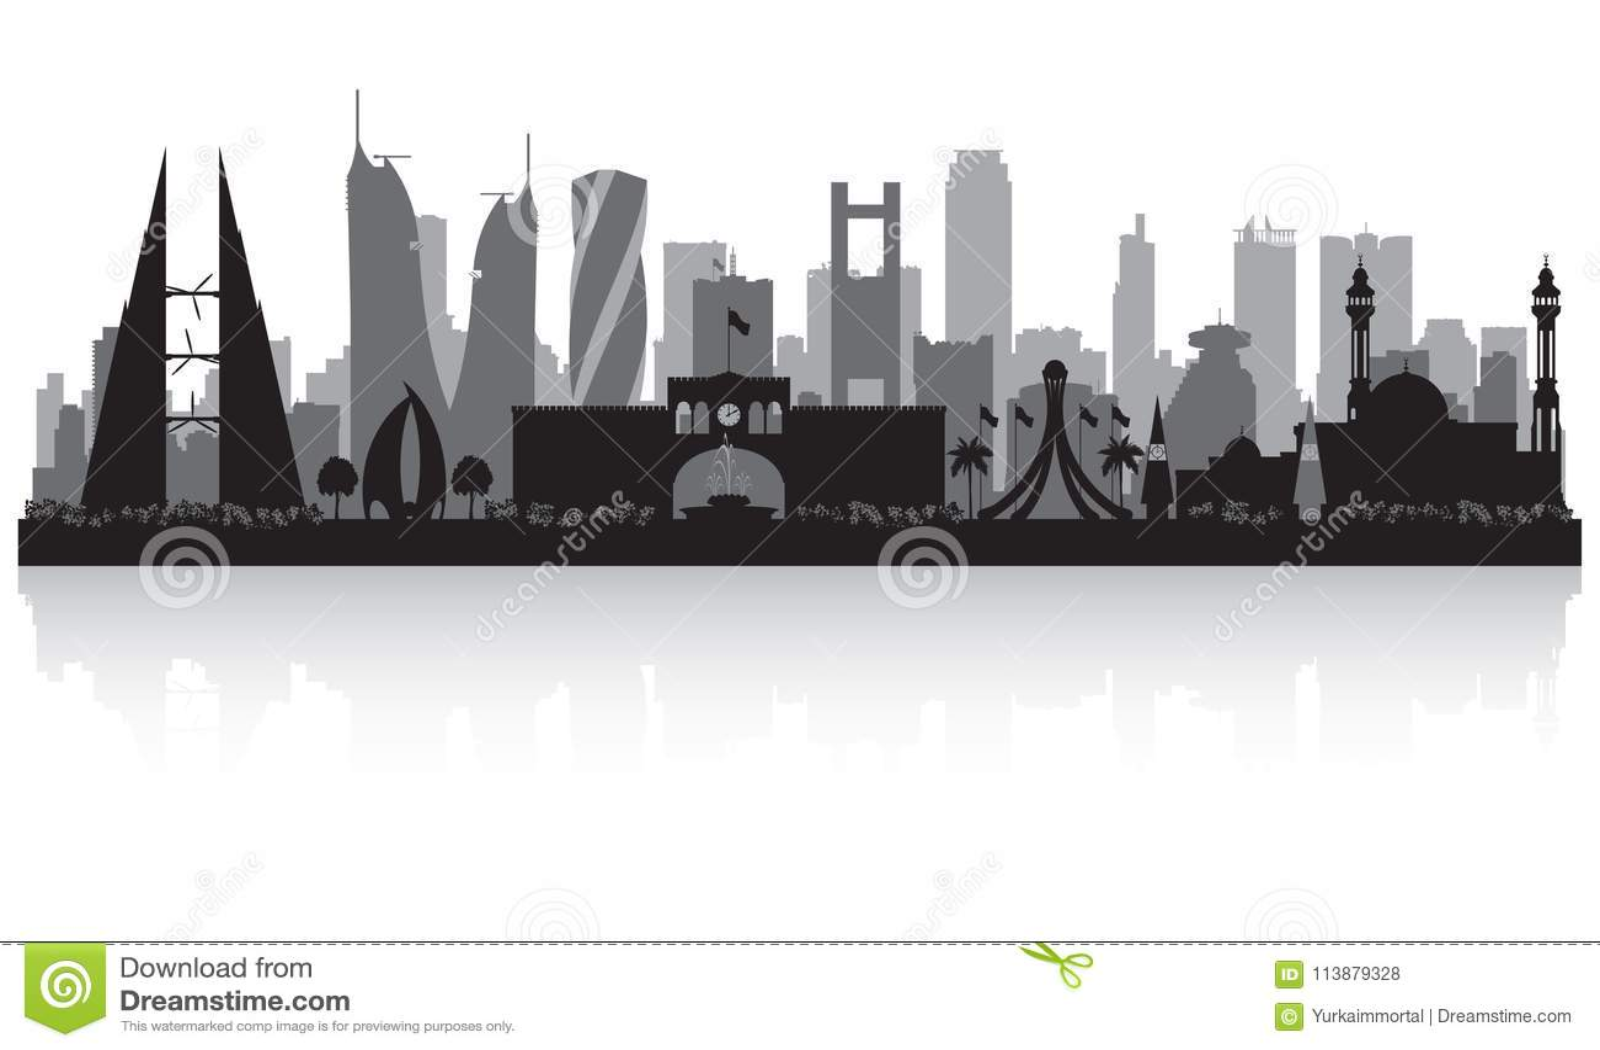 5f8e92386162 Manama Bahrain City Skyline Silhouette Stock Vector - Illustration ...